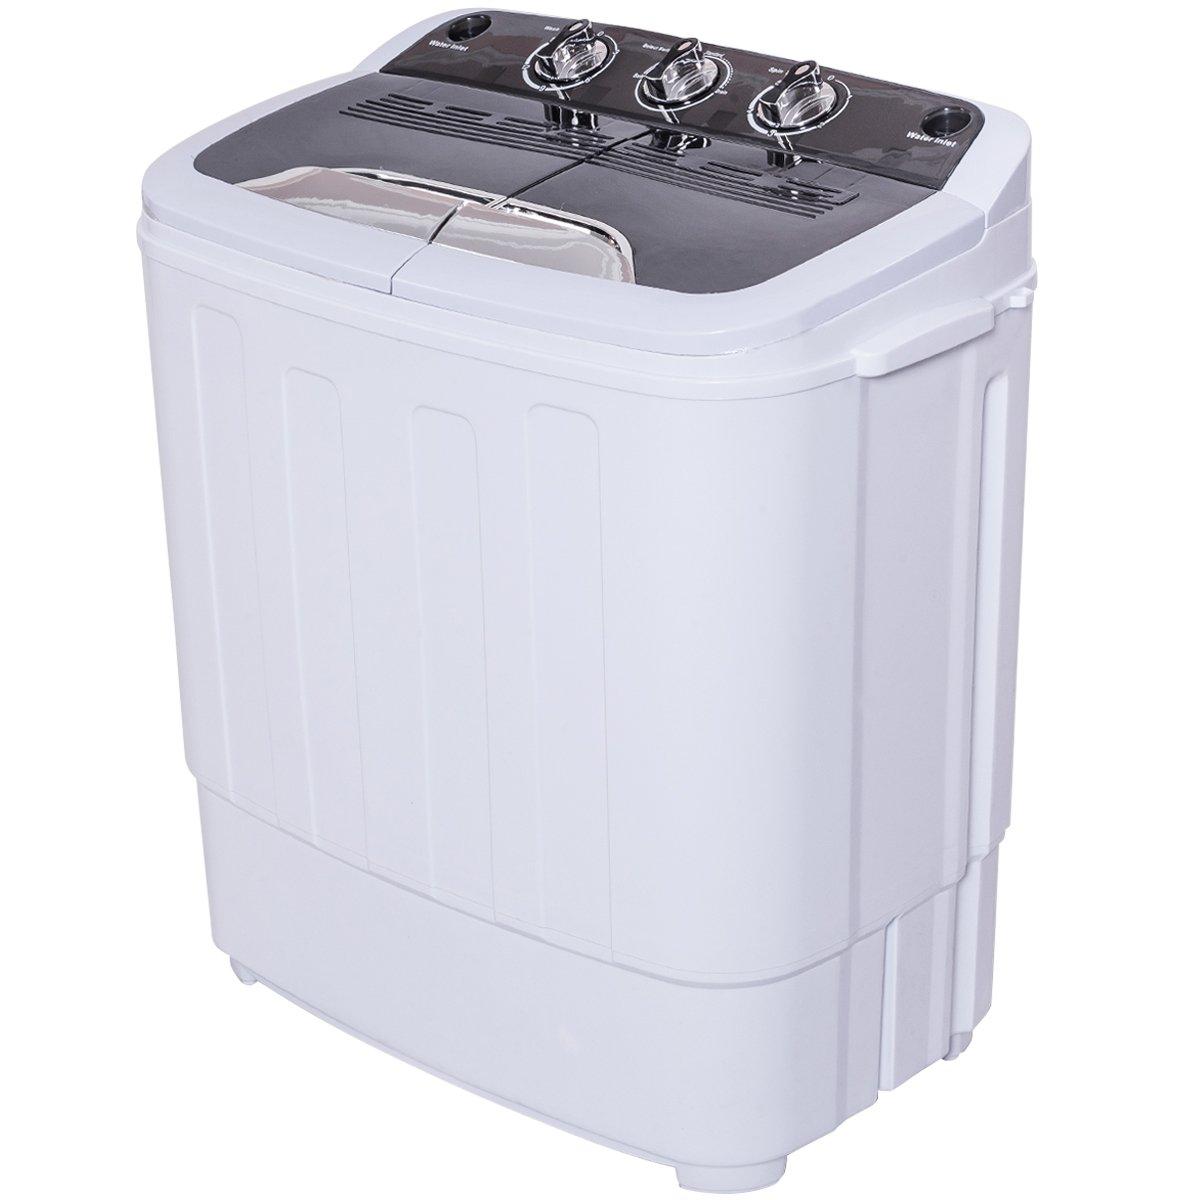 Giantex Portable Compact 13 Lbs Mini Twin Tub Washing Machine Washer Spin Dryer (Black&White)